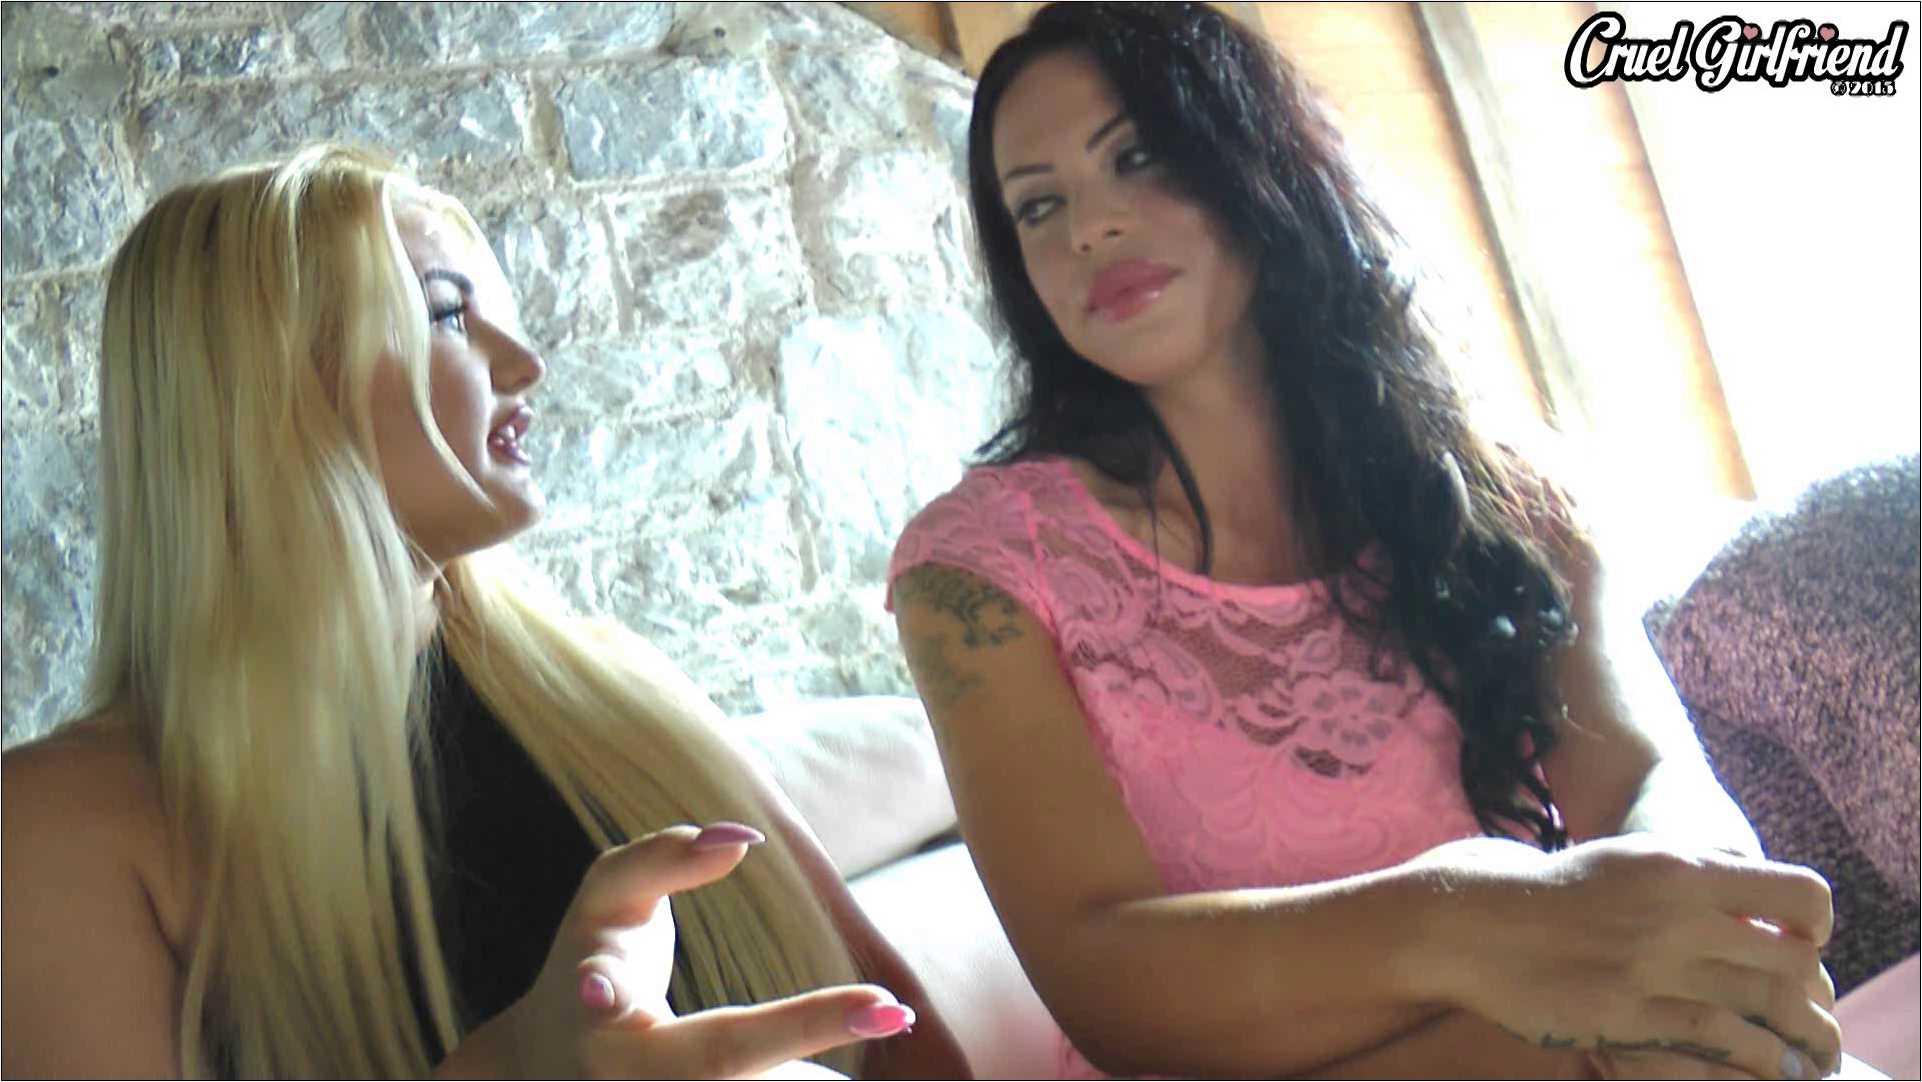 Maxie In Scene: Single Girls - CRUELGF - FULL HD/1080p/WMV